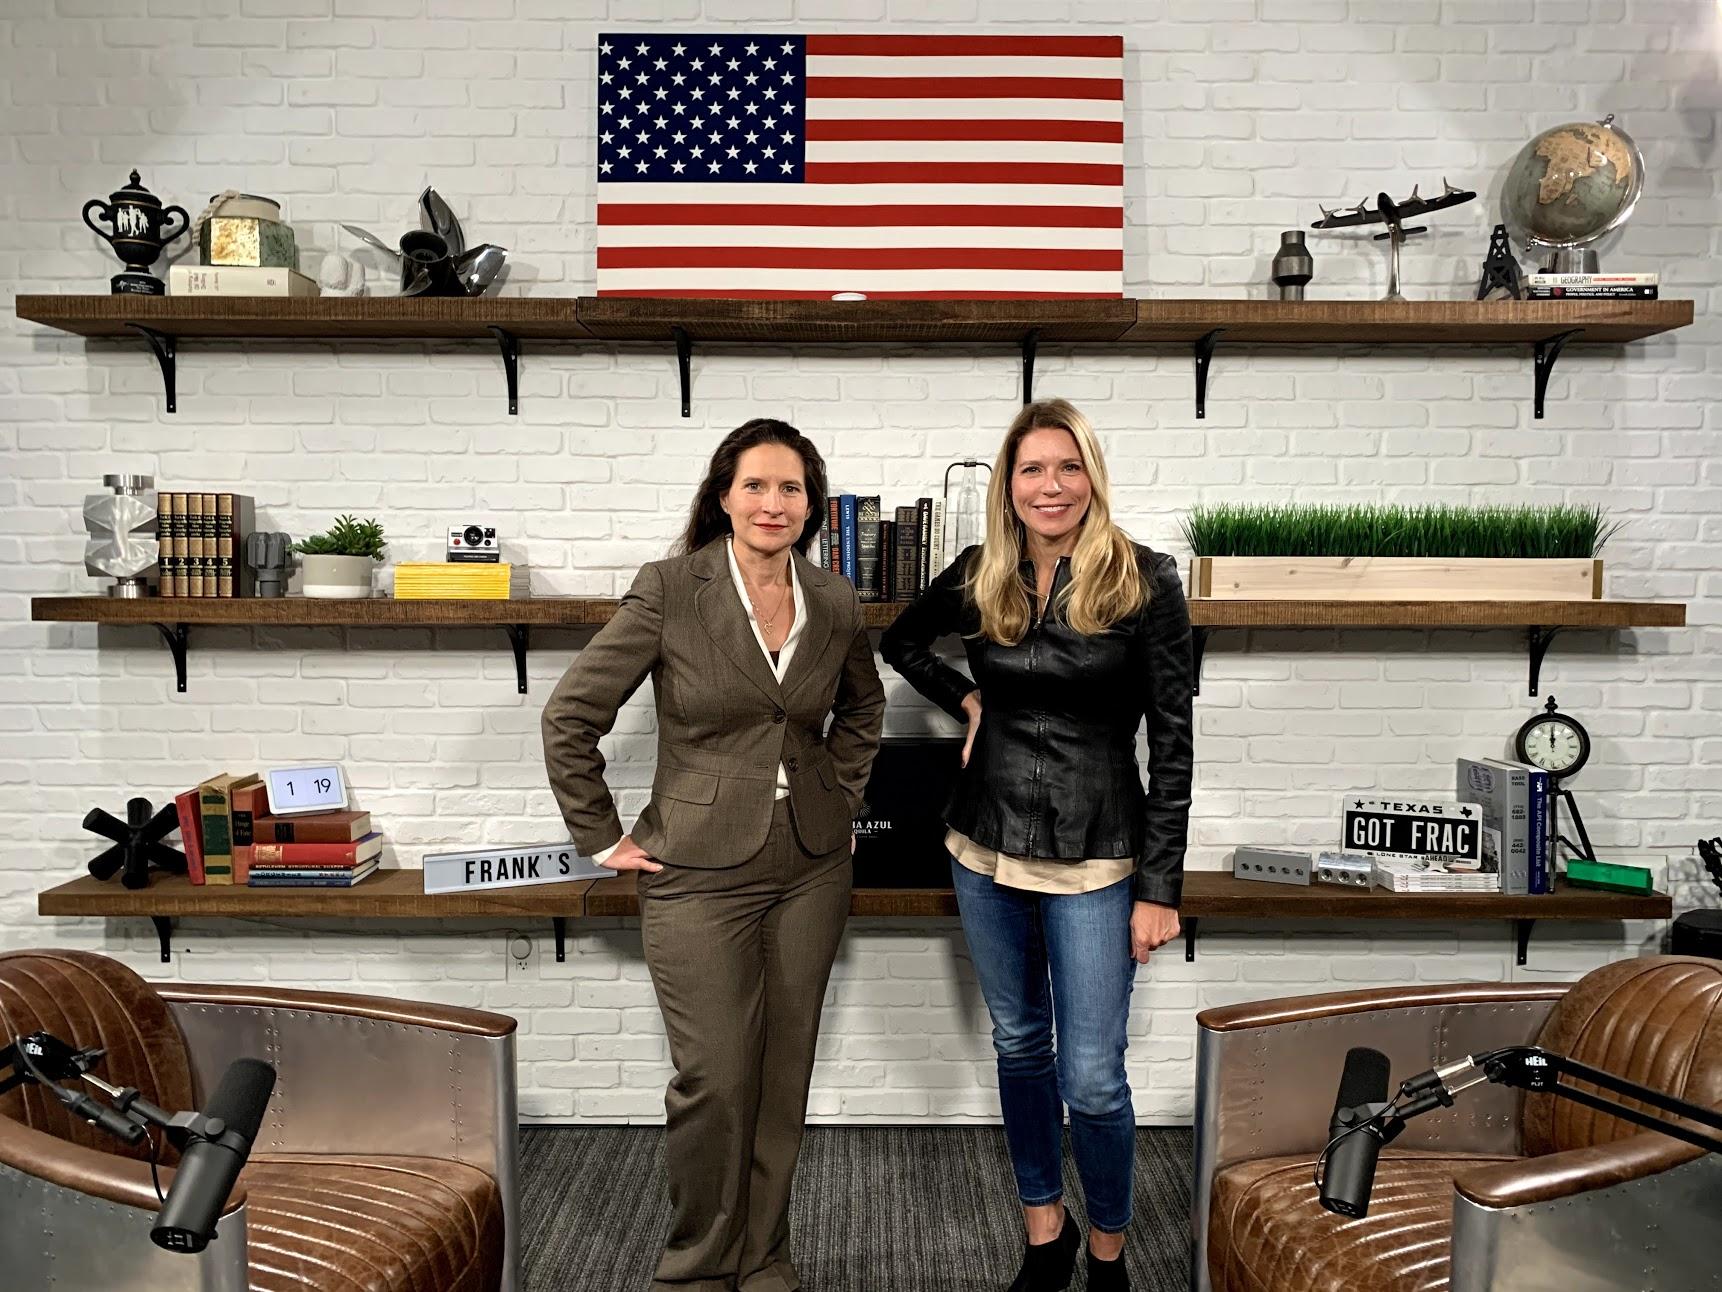 Energy in Transition host Leslie Beyer with Frank's International CFO Melissa Cougle